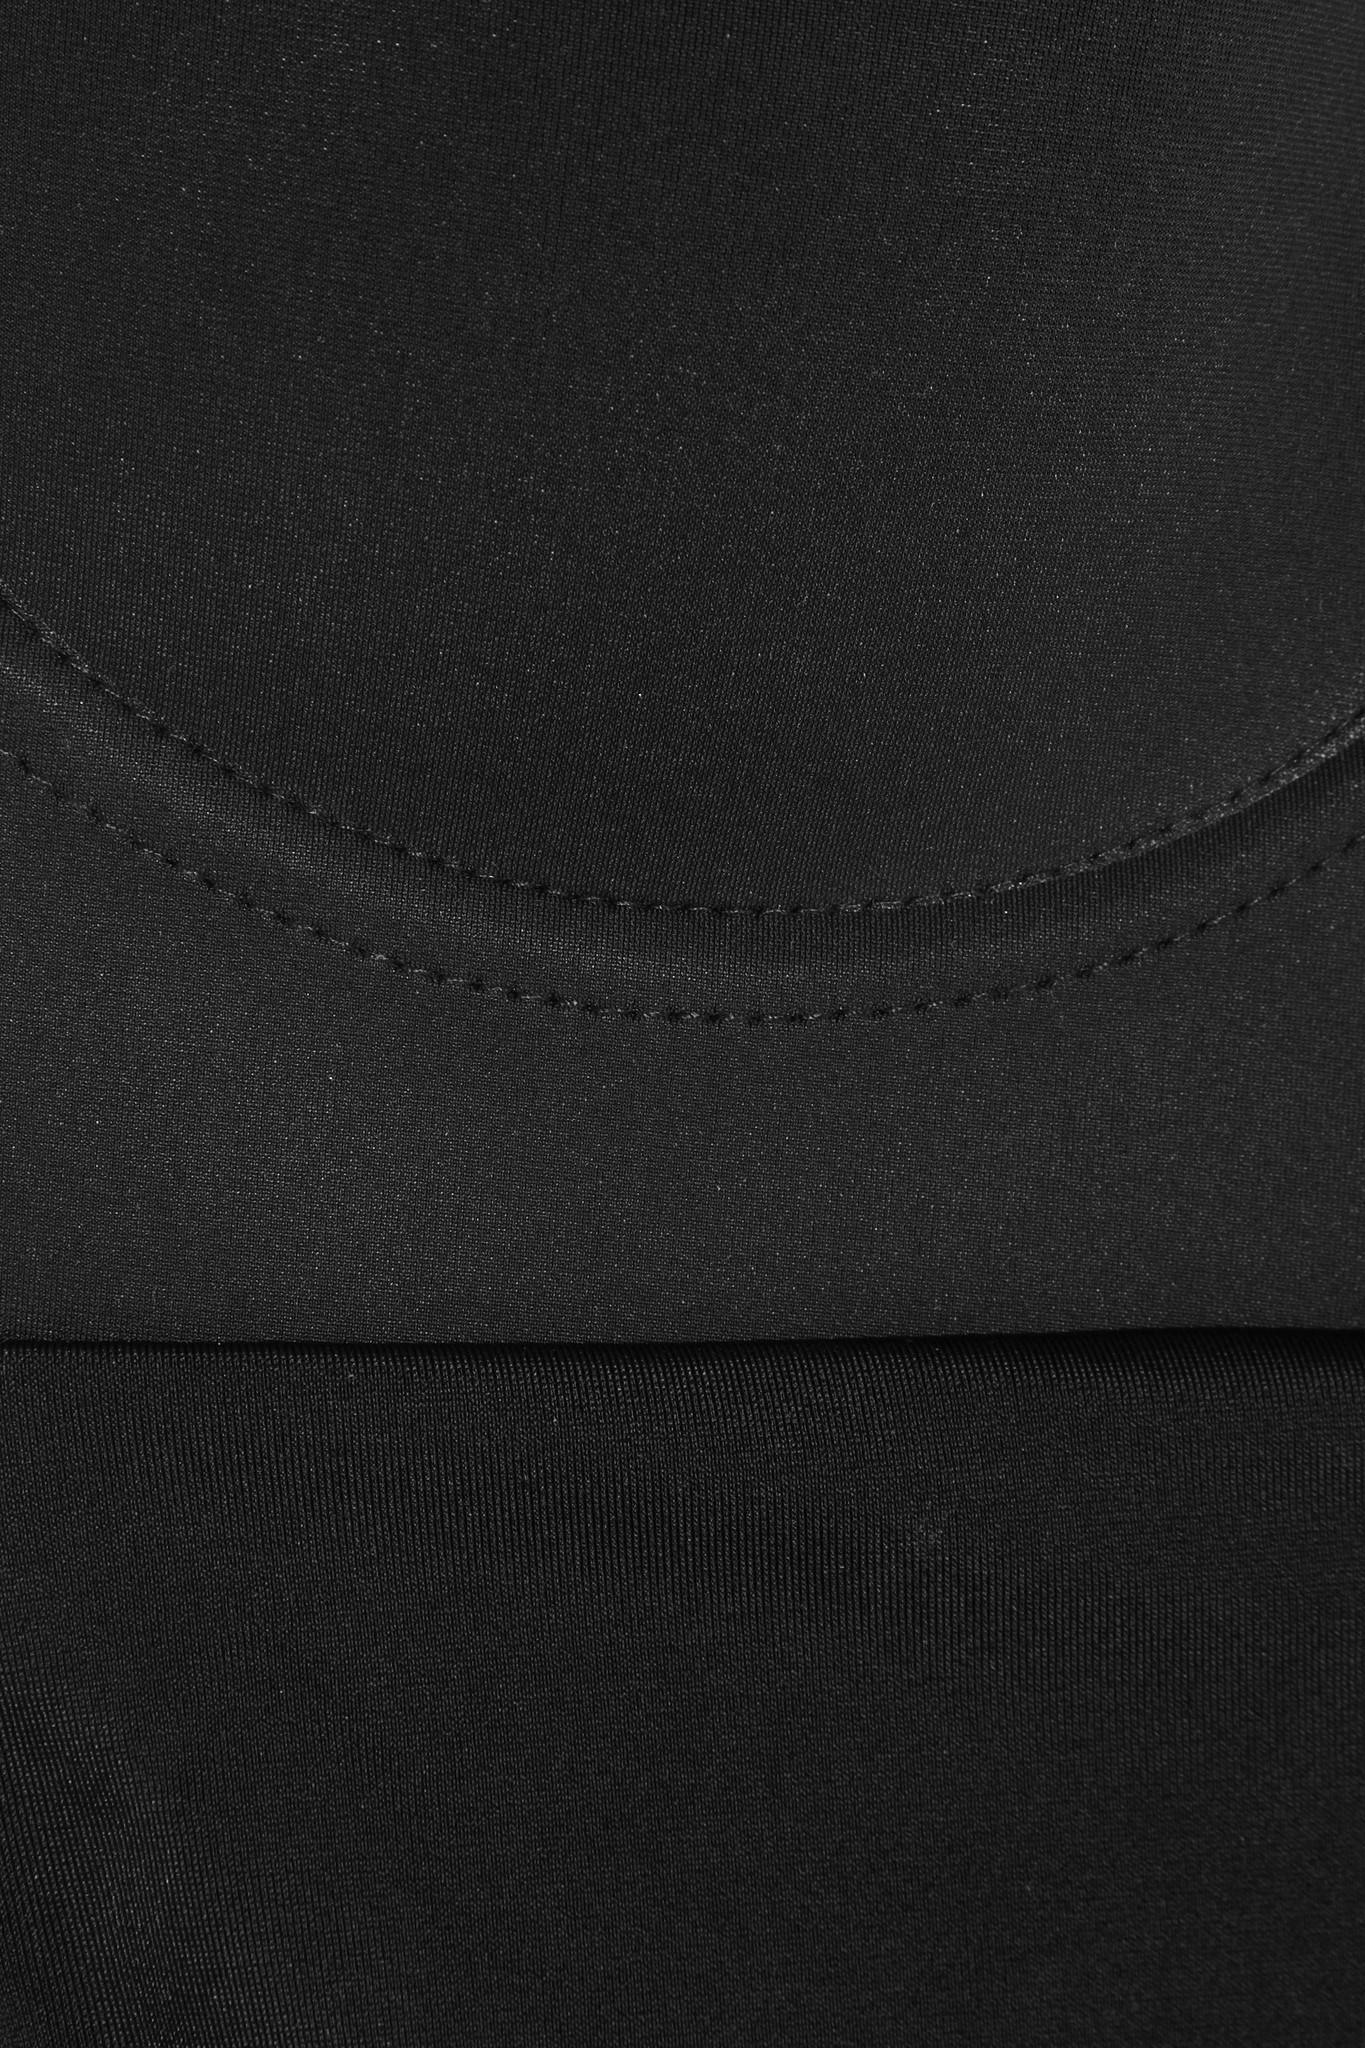 61988b1627 Fashion Forms - Black U-plunge Self-adhesive Backless Thong Bodysuit -  Lyst. View fullscreen